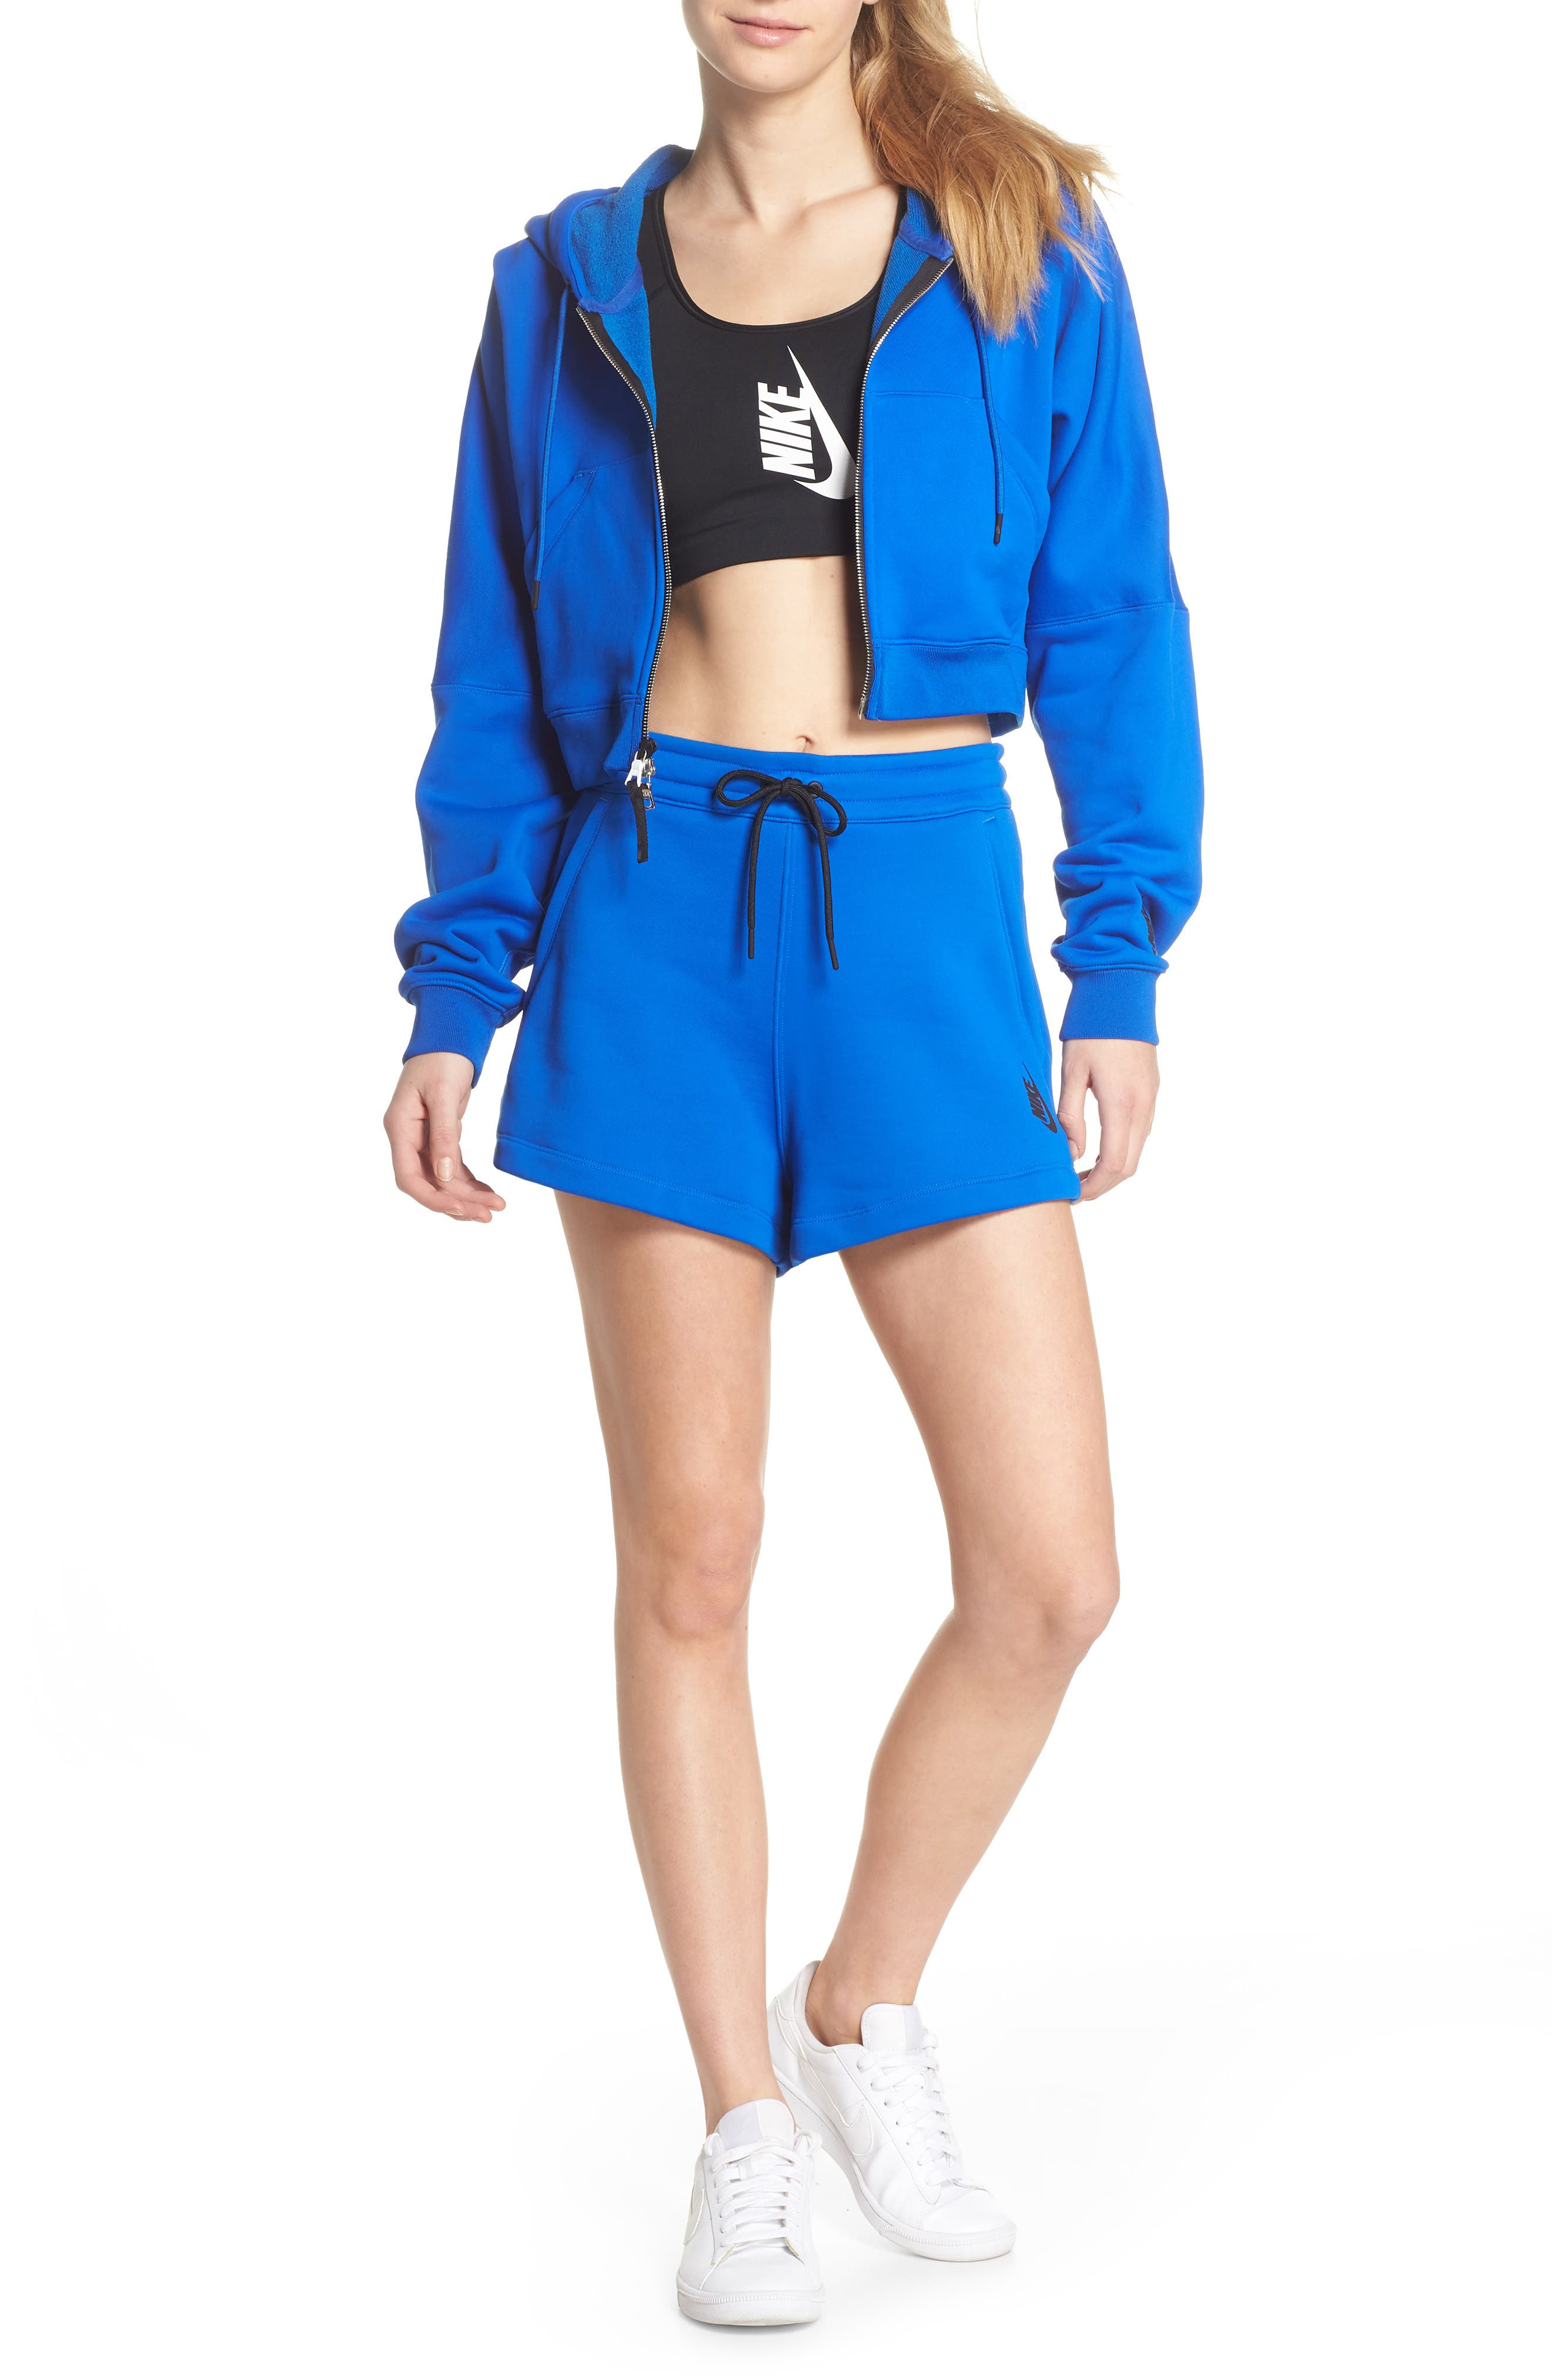 NikeLab Collection Women's Fleece Shorts,                             Alternate thumbnail 7, color,                             Hyper Cobalt/ Black